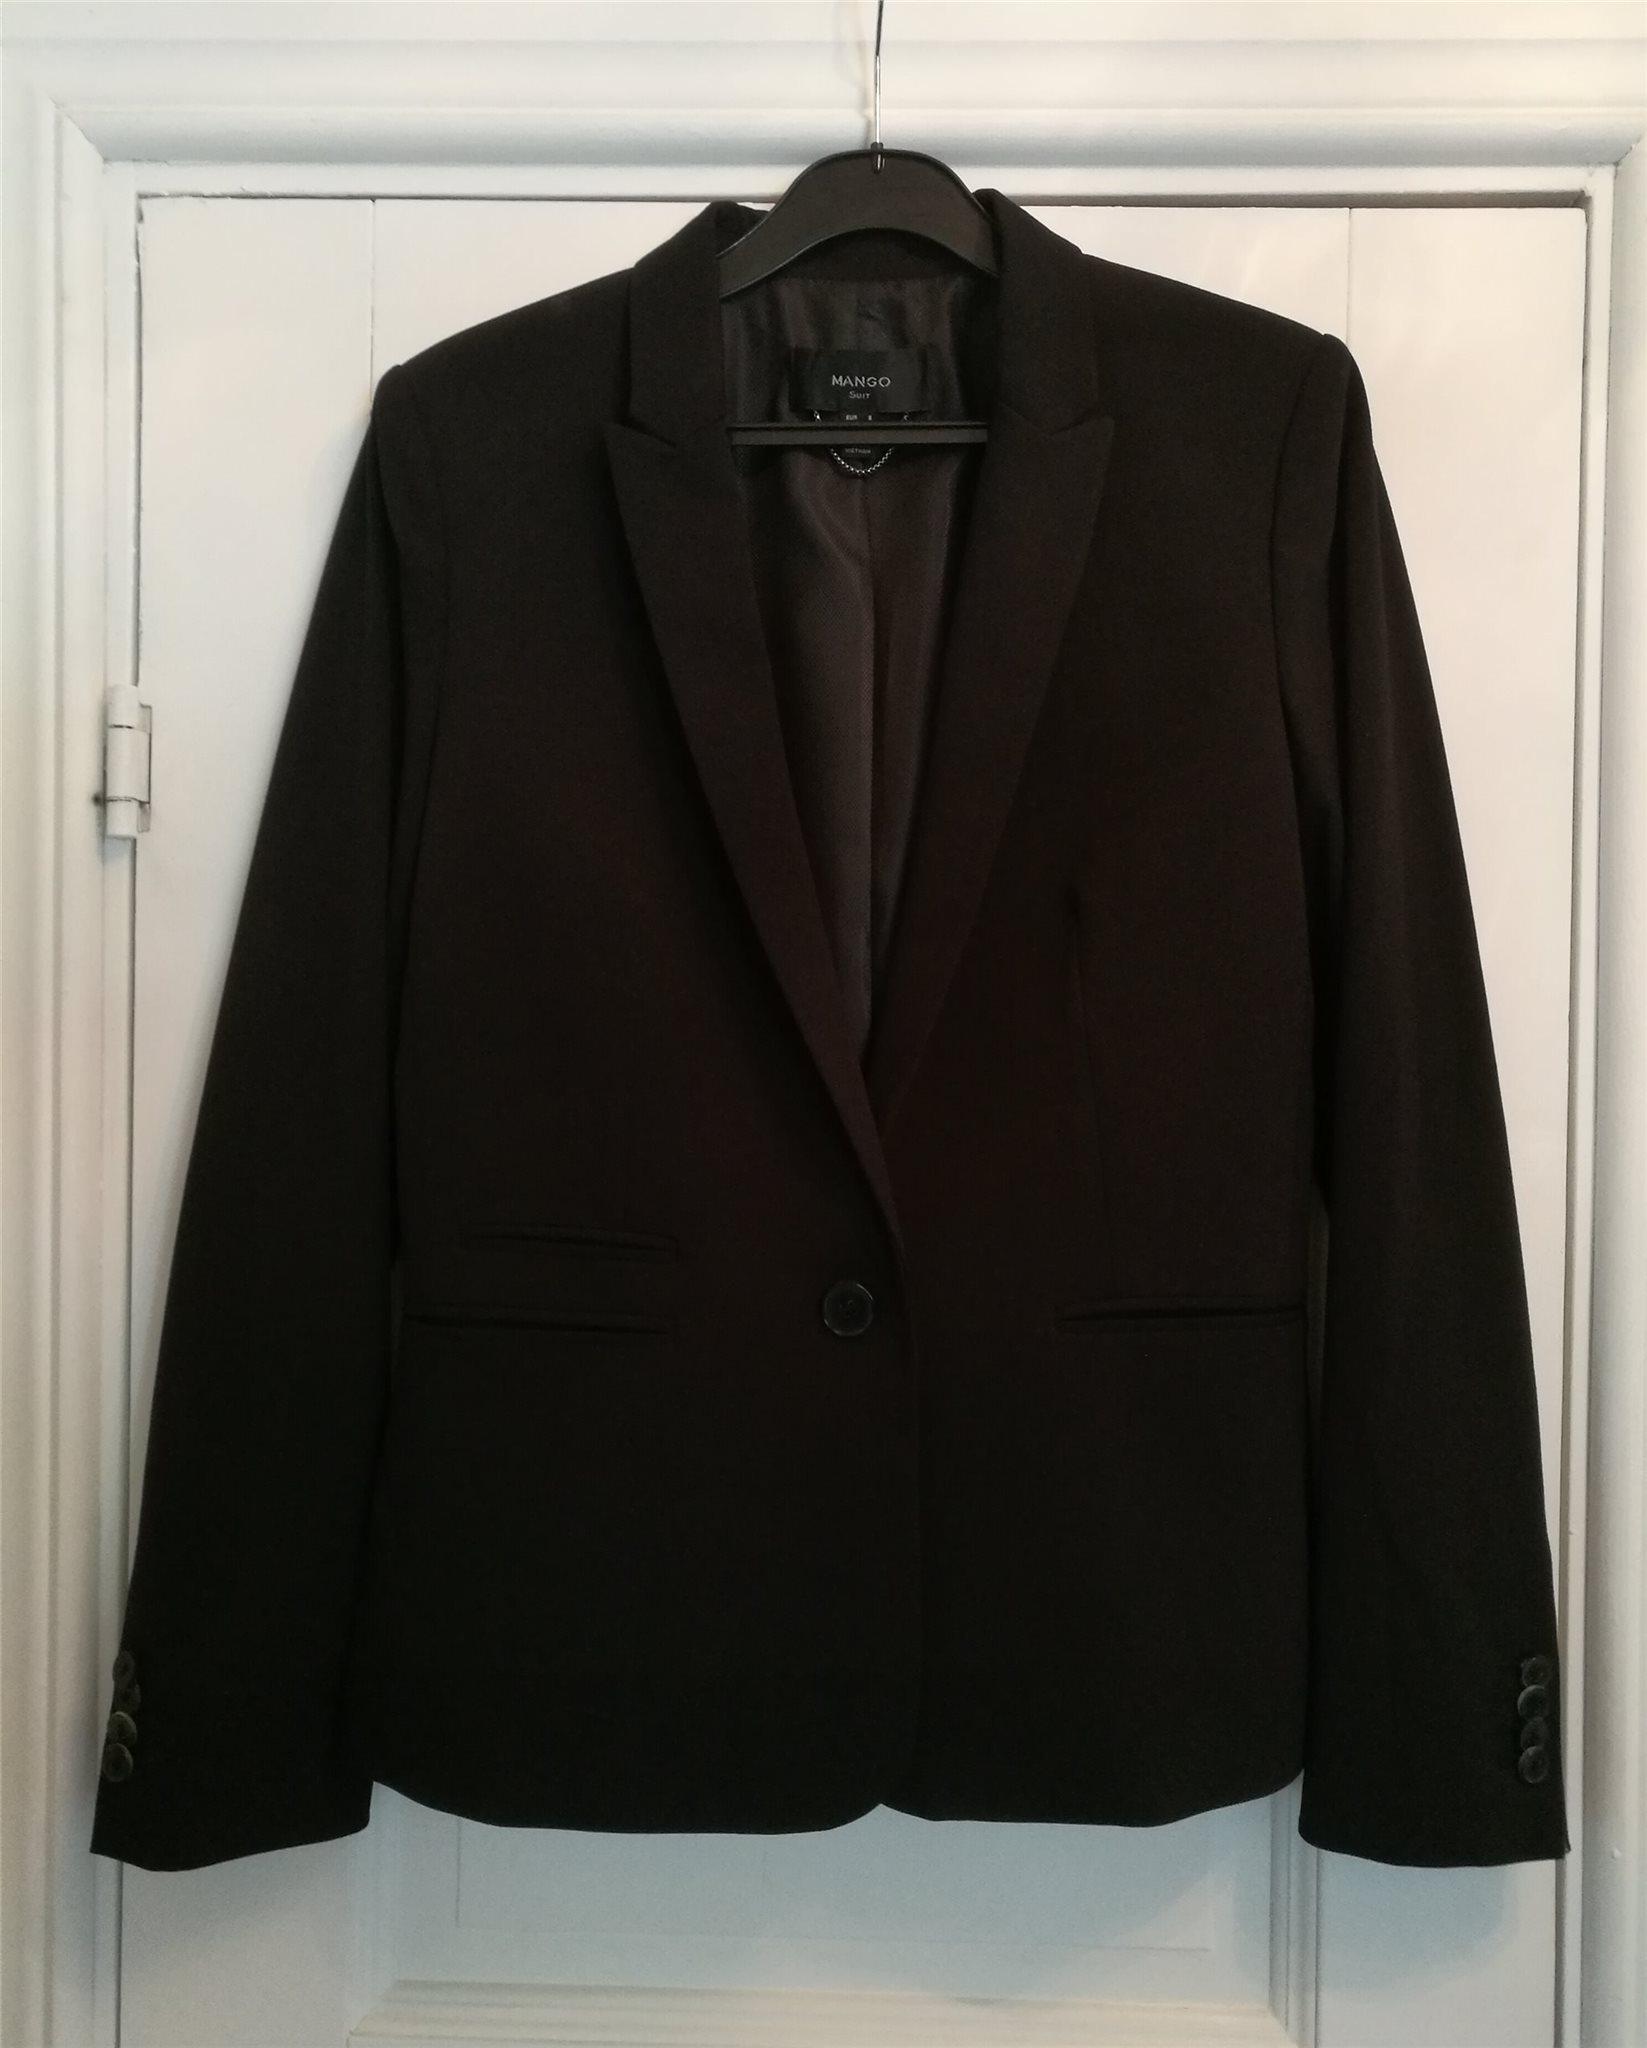 Snygg svart dam kostym ( suit ) - kavaj & finbyxor fr. MANGO - Small - S - 38